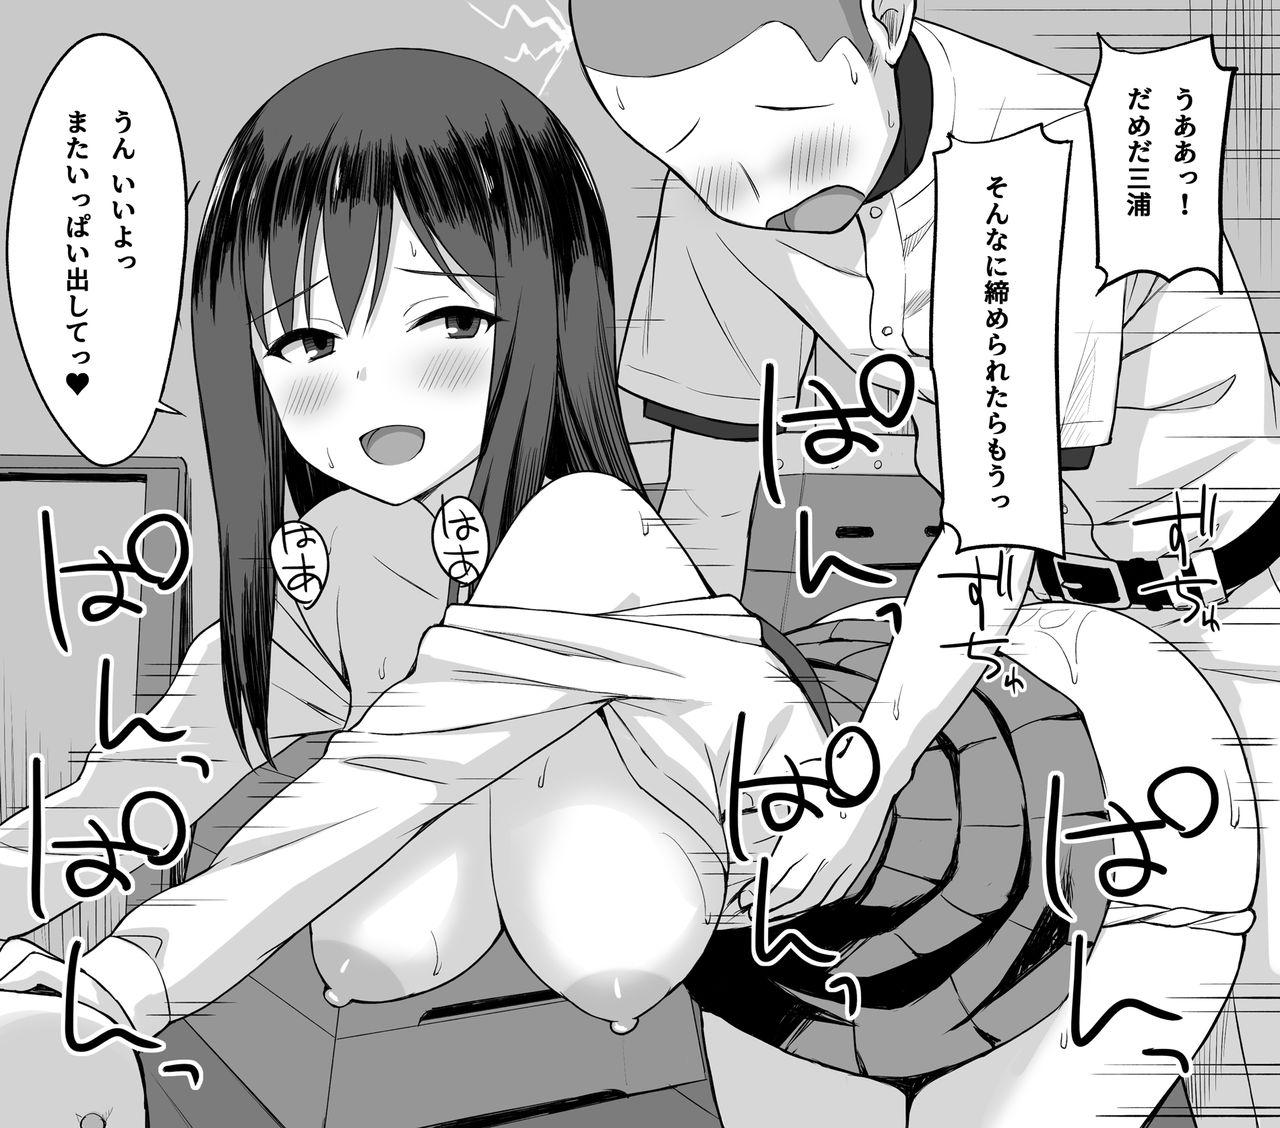 Bitch na SeFri no Tsukurikata 44